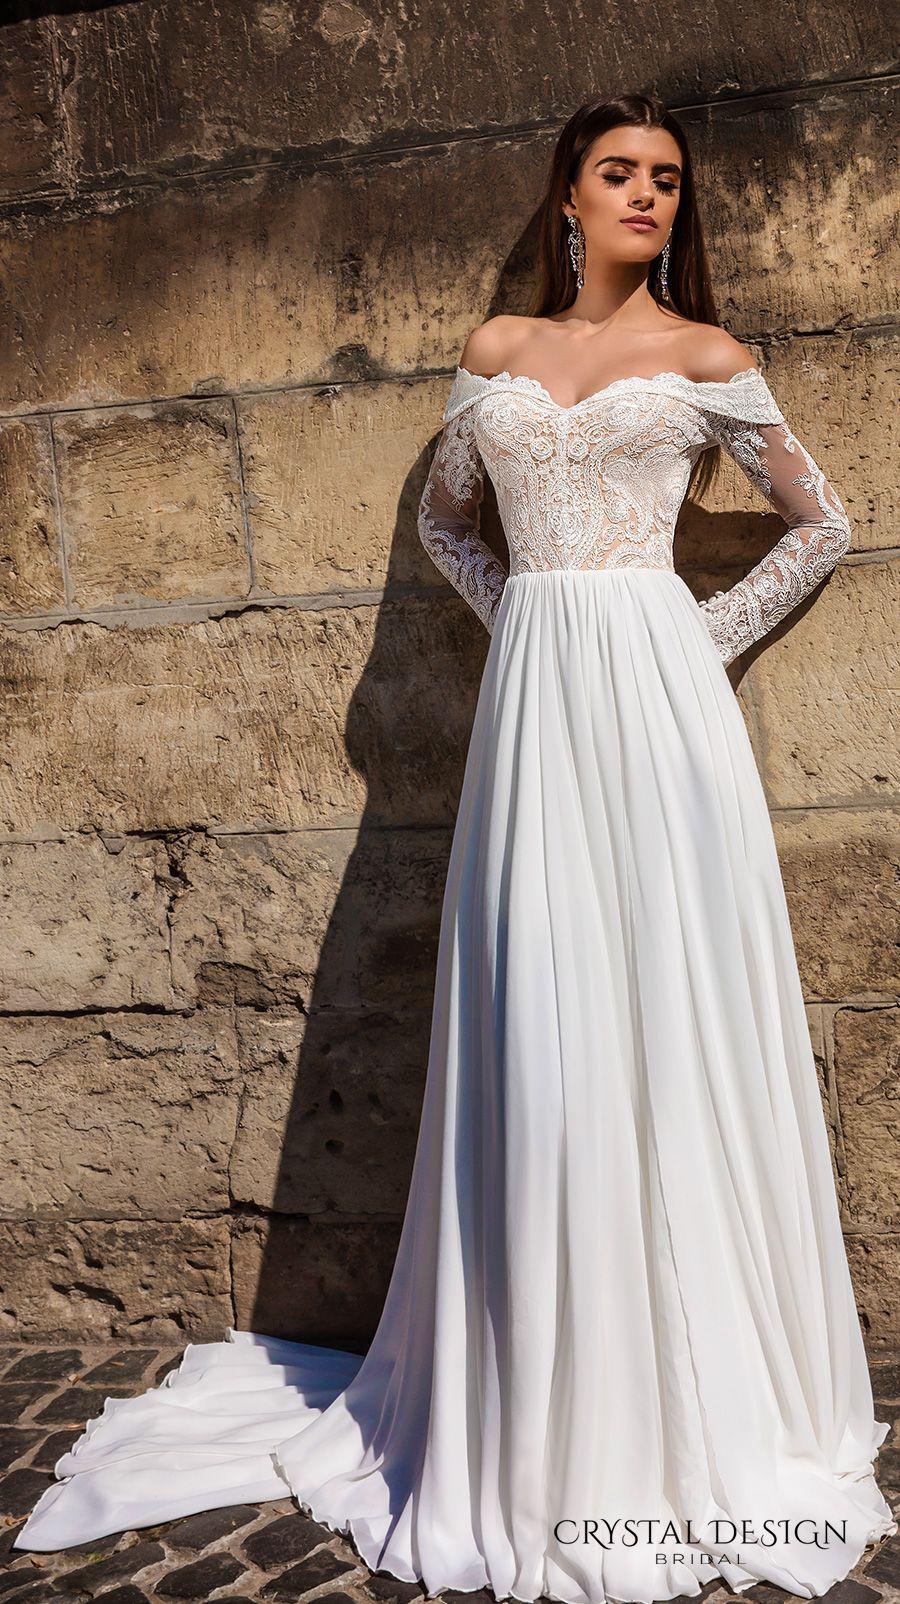 Crystal Design 2016 Wedding Dresses Wedding dresses